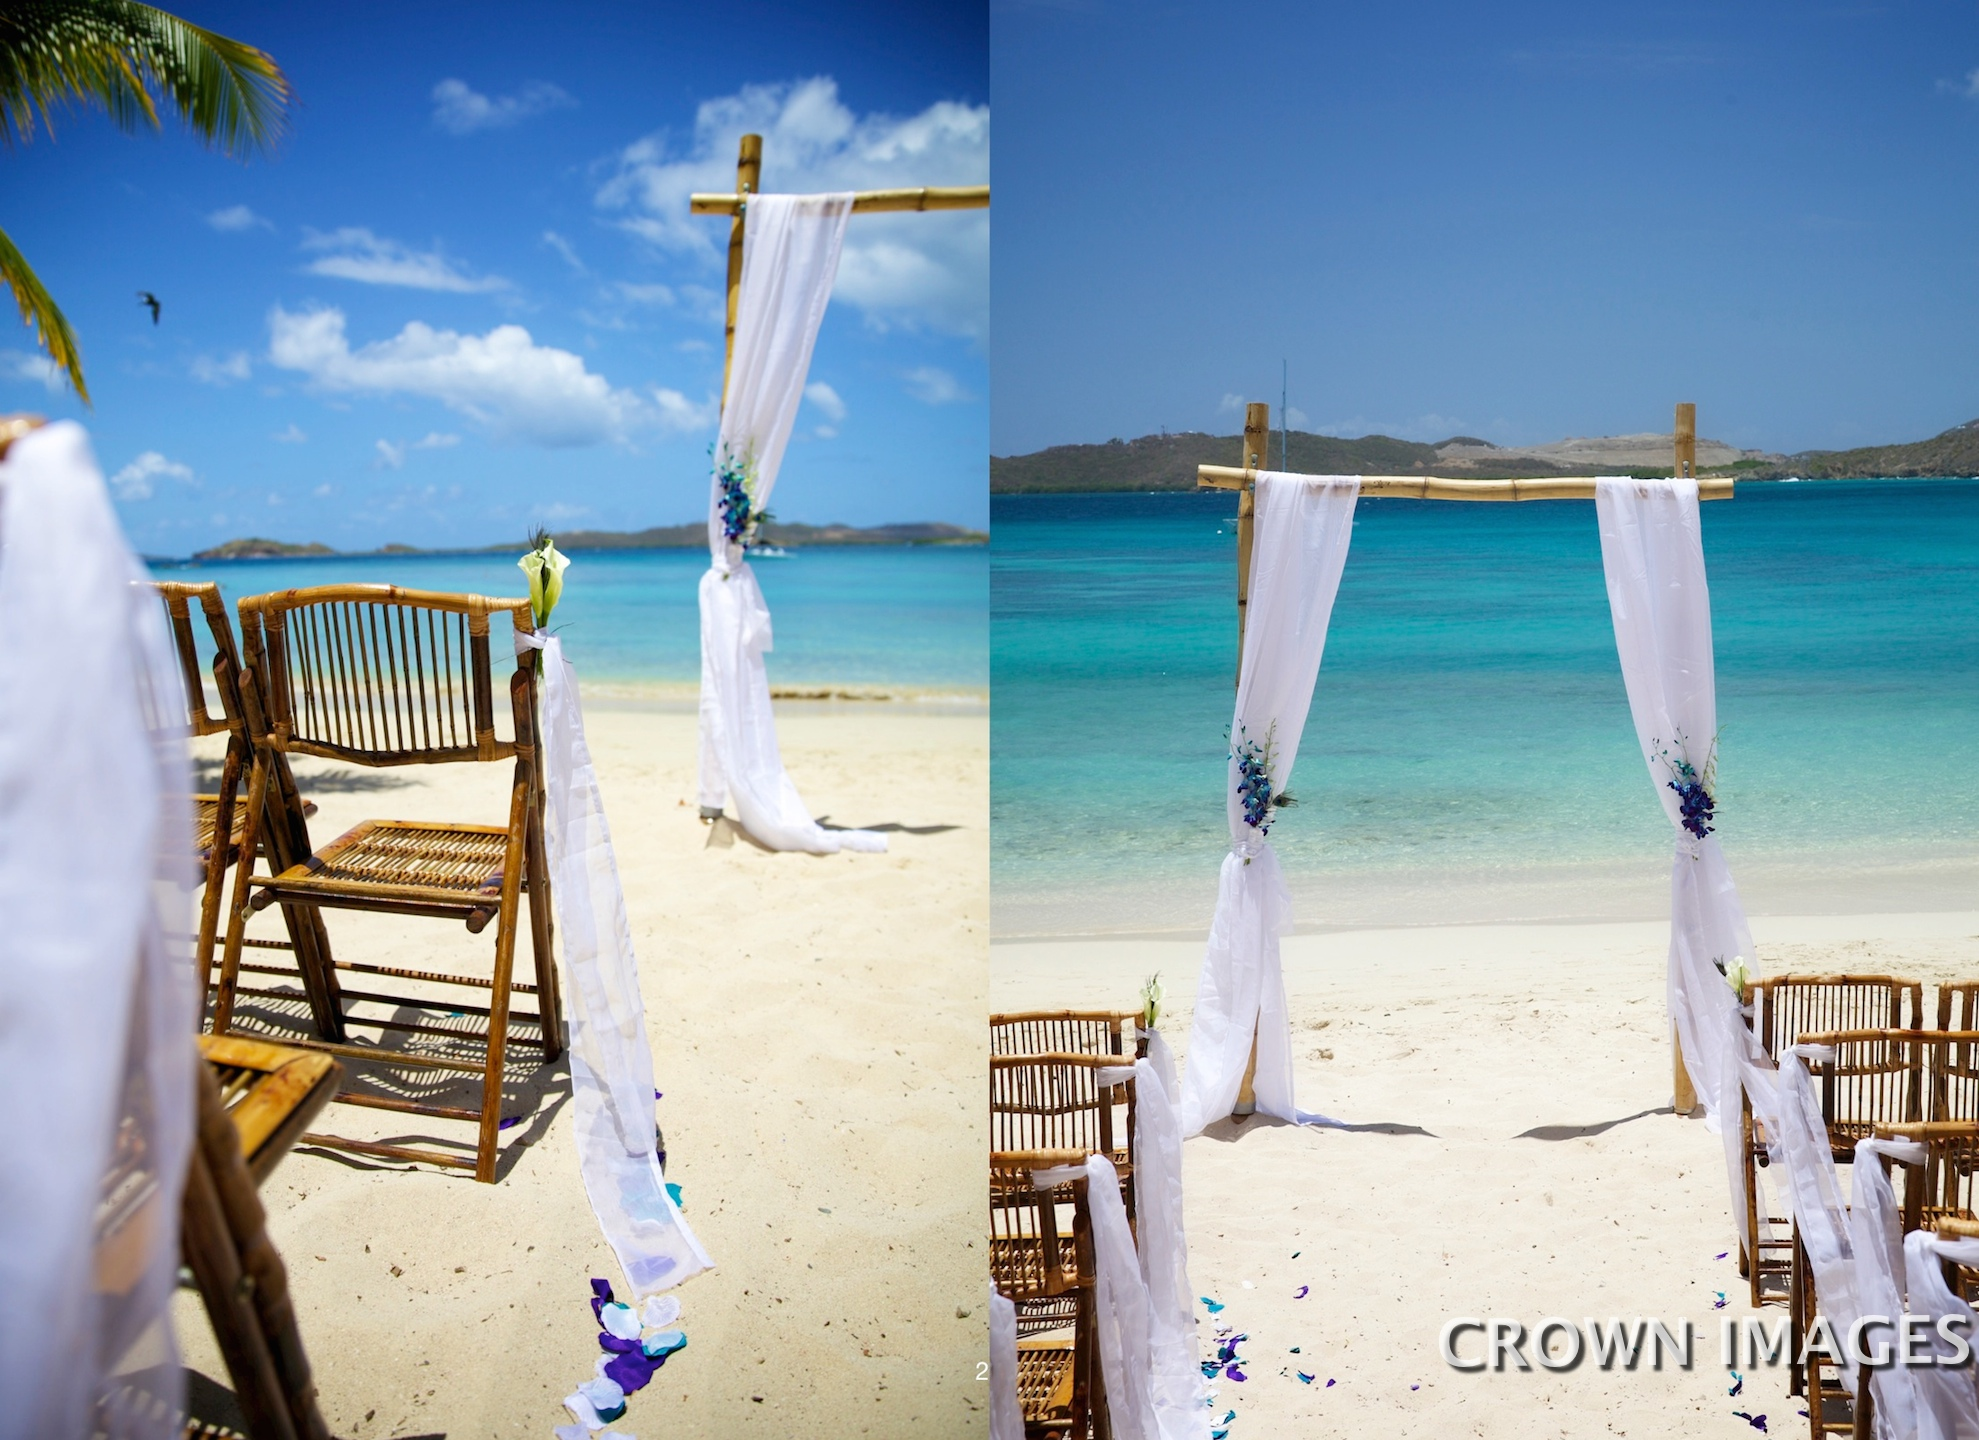 st thomas beach location for a wedding